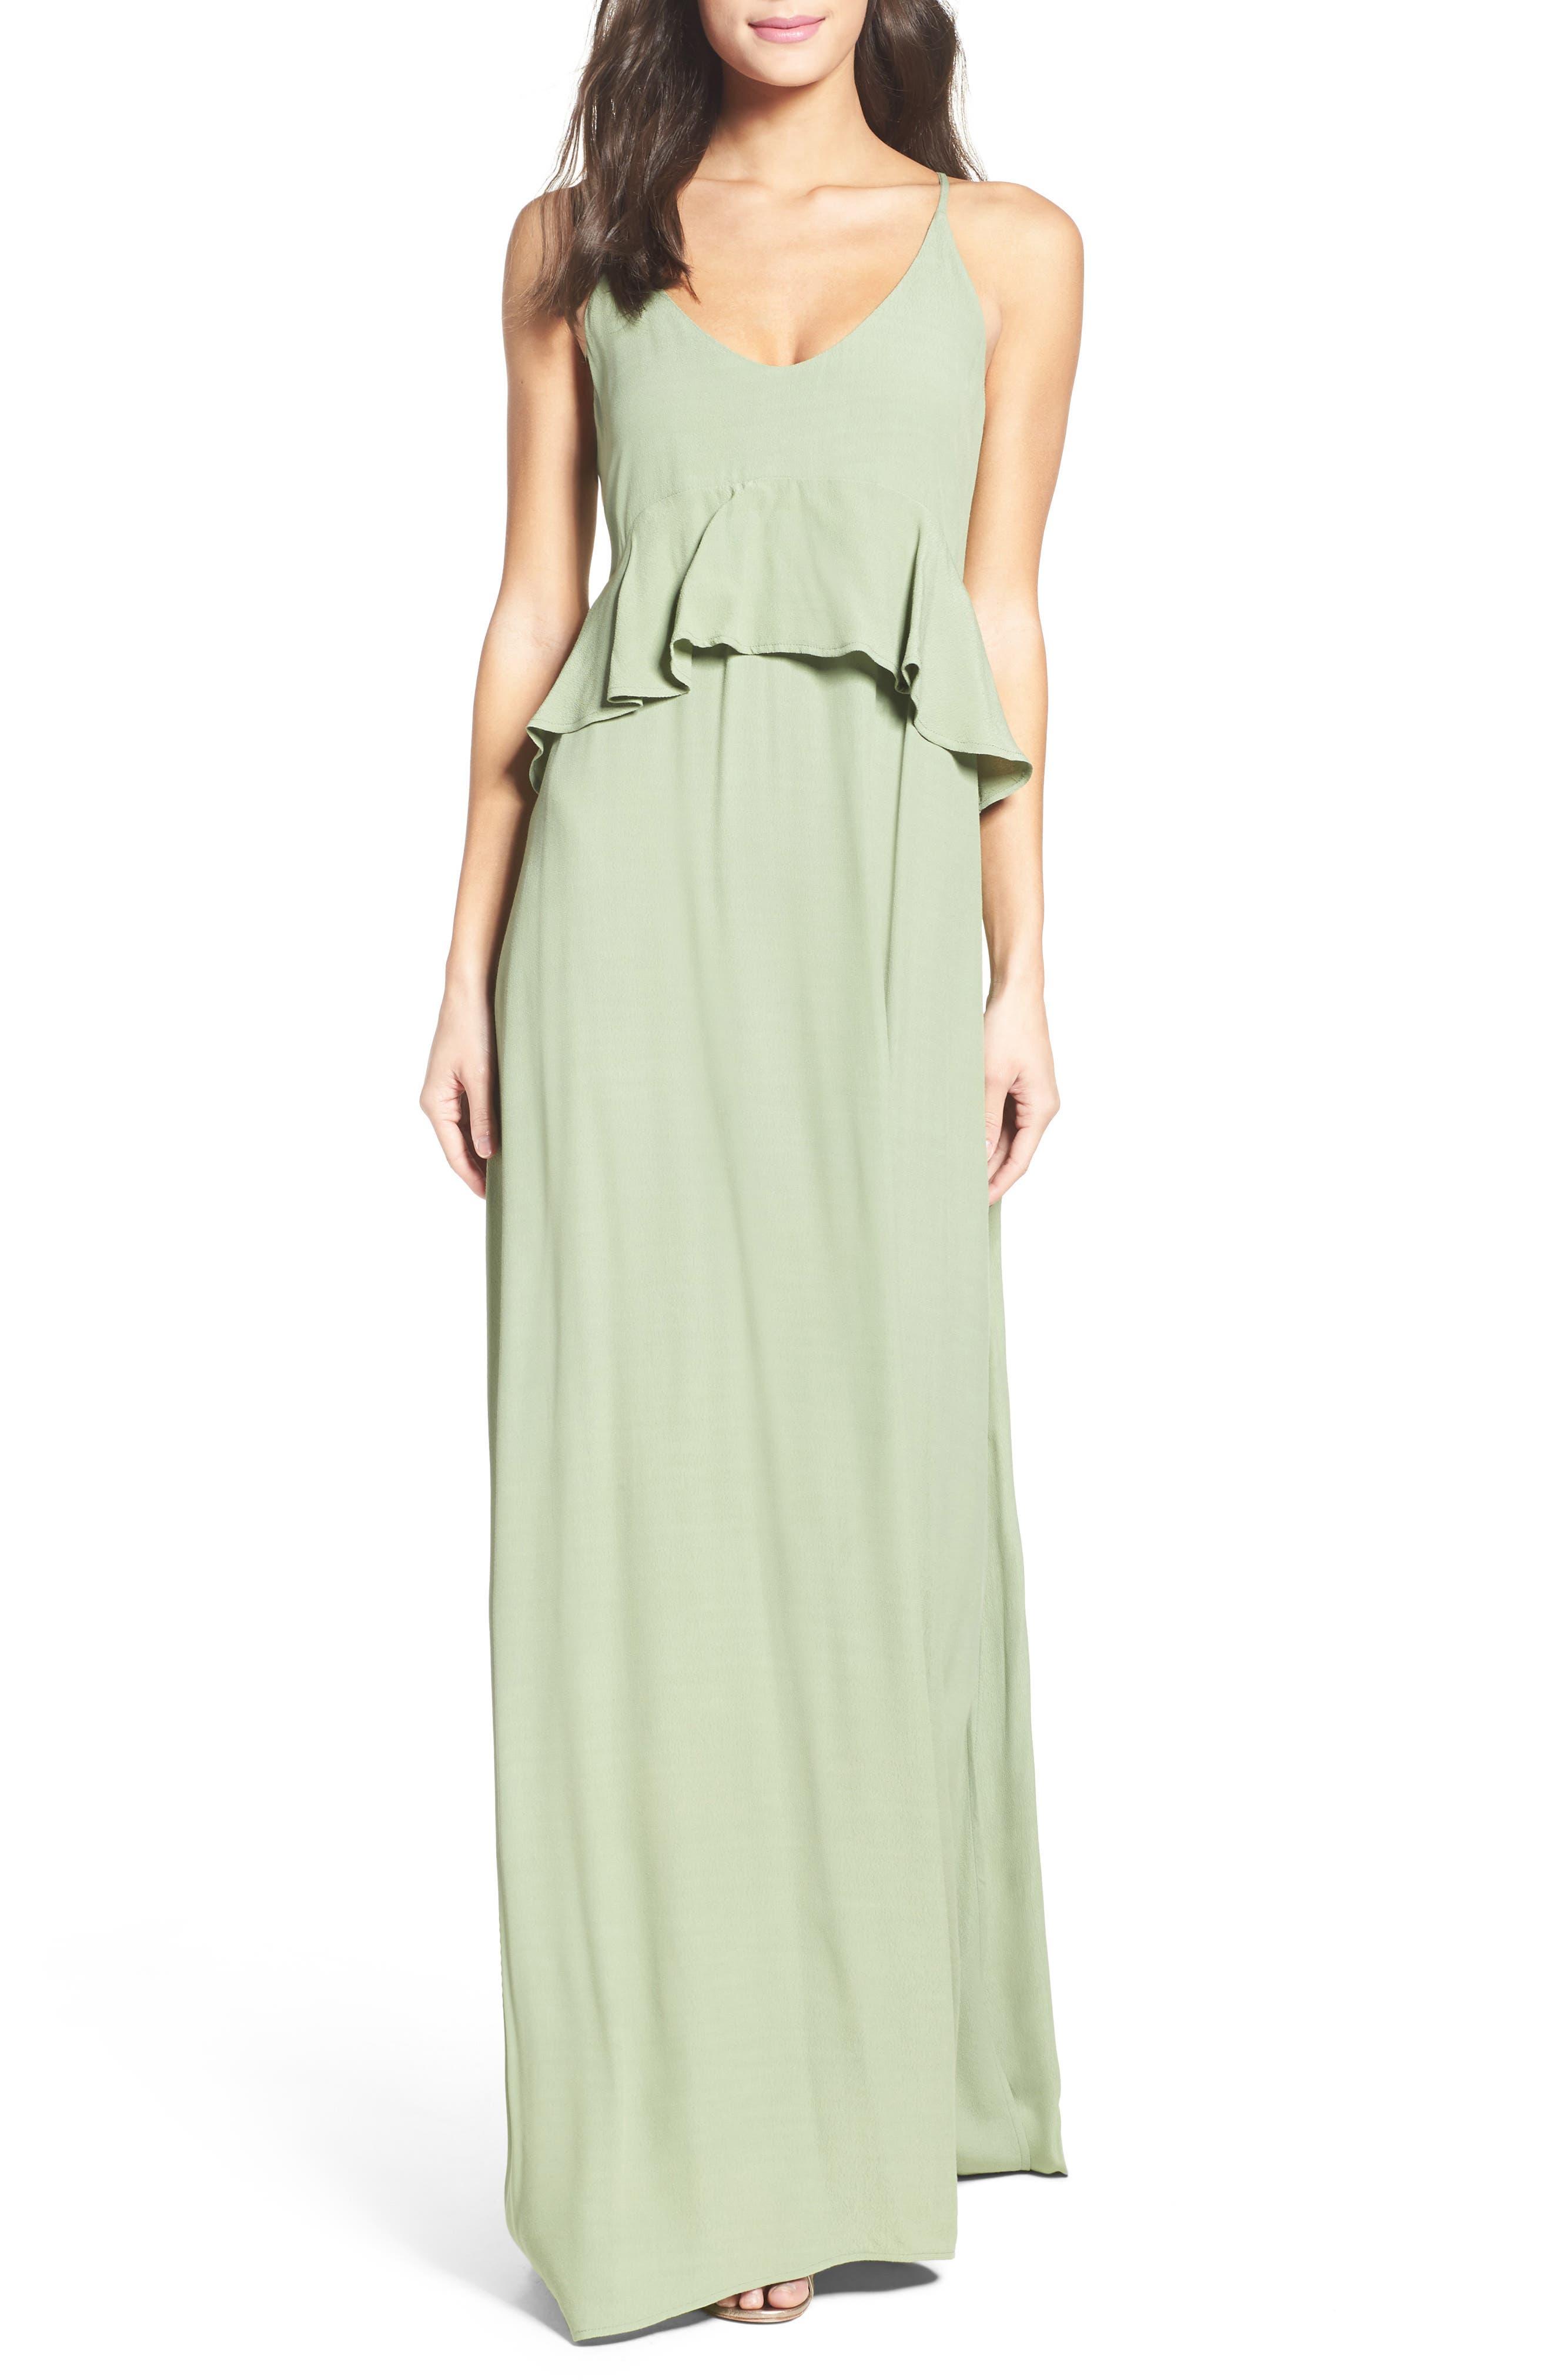 Alternate Image 1 Selected - Roe + May Jolie Crepe Peplum Dress